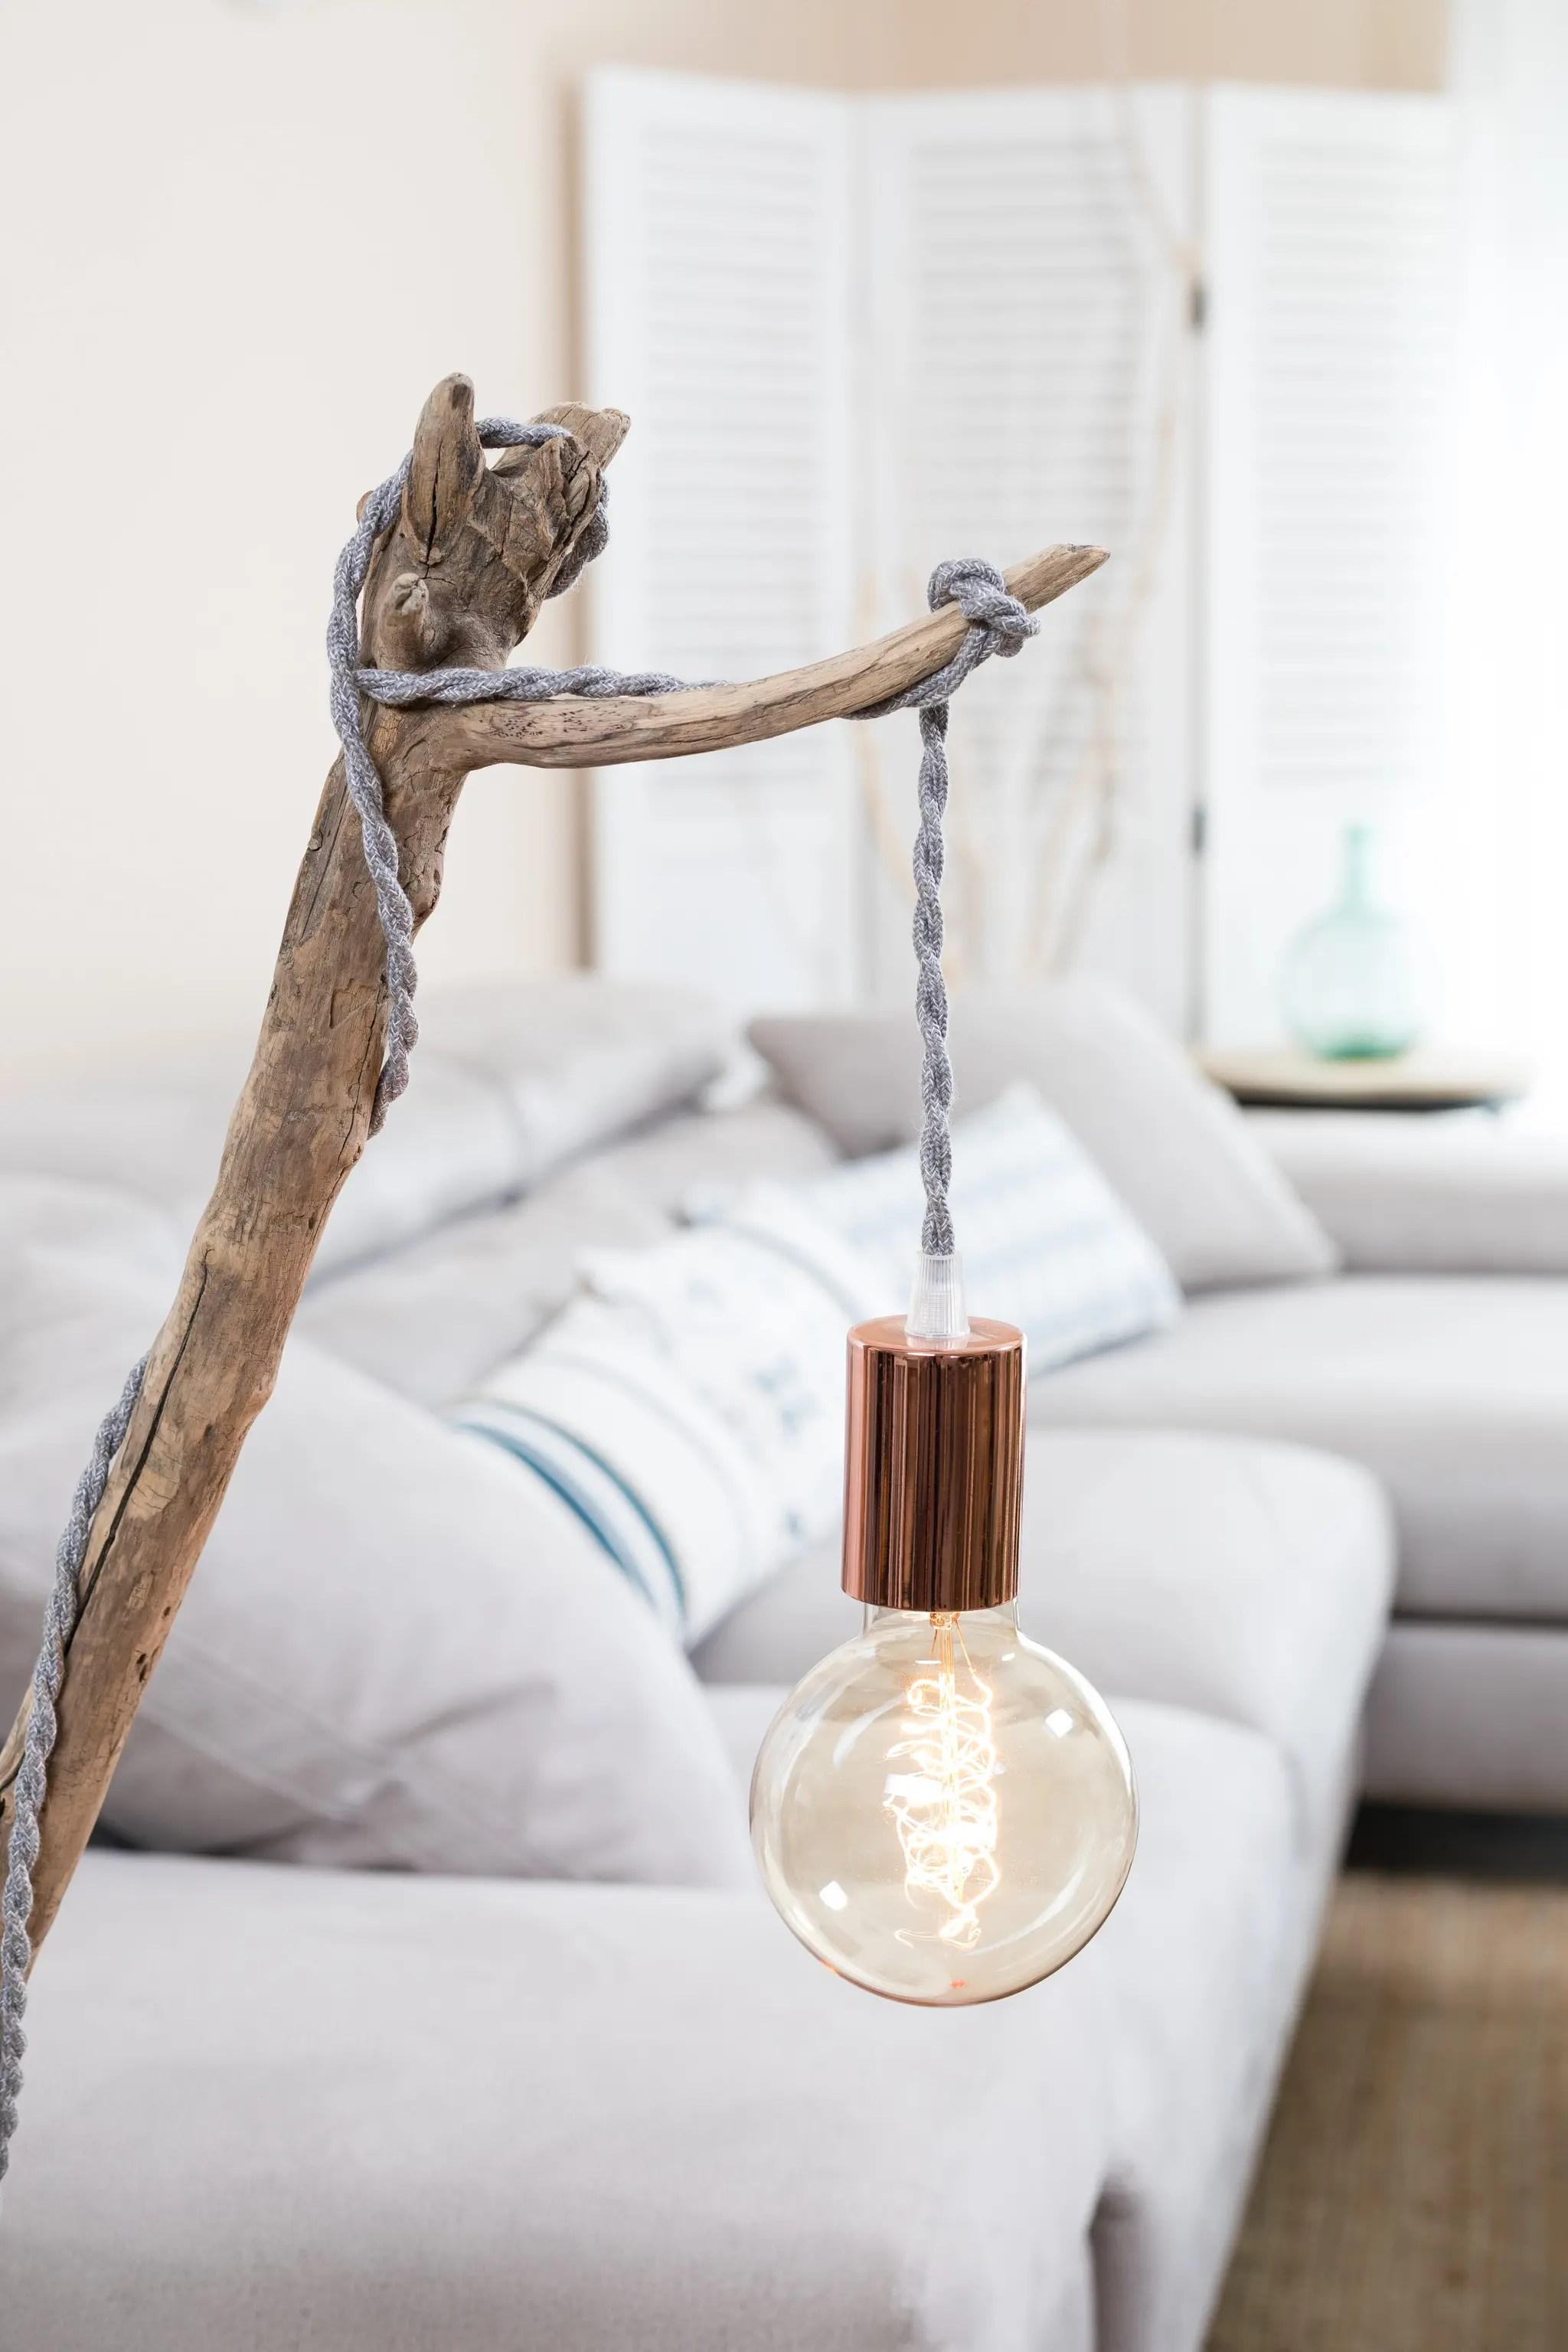 lampe en bois flott et ampoule globe vintage ambiance. Black Bedroom Furniture Sets. Home Design Ideas